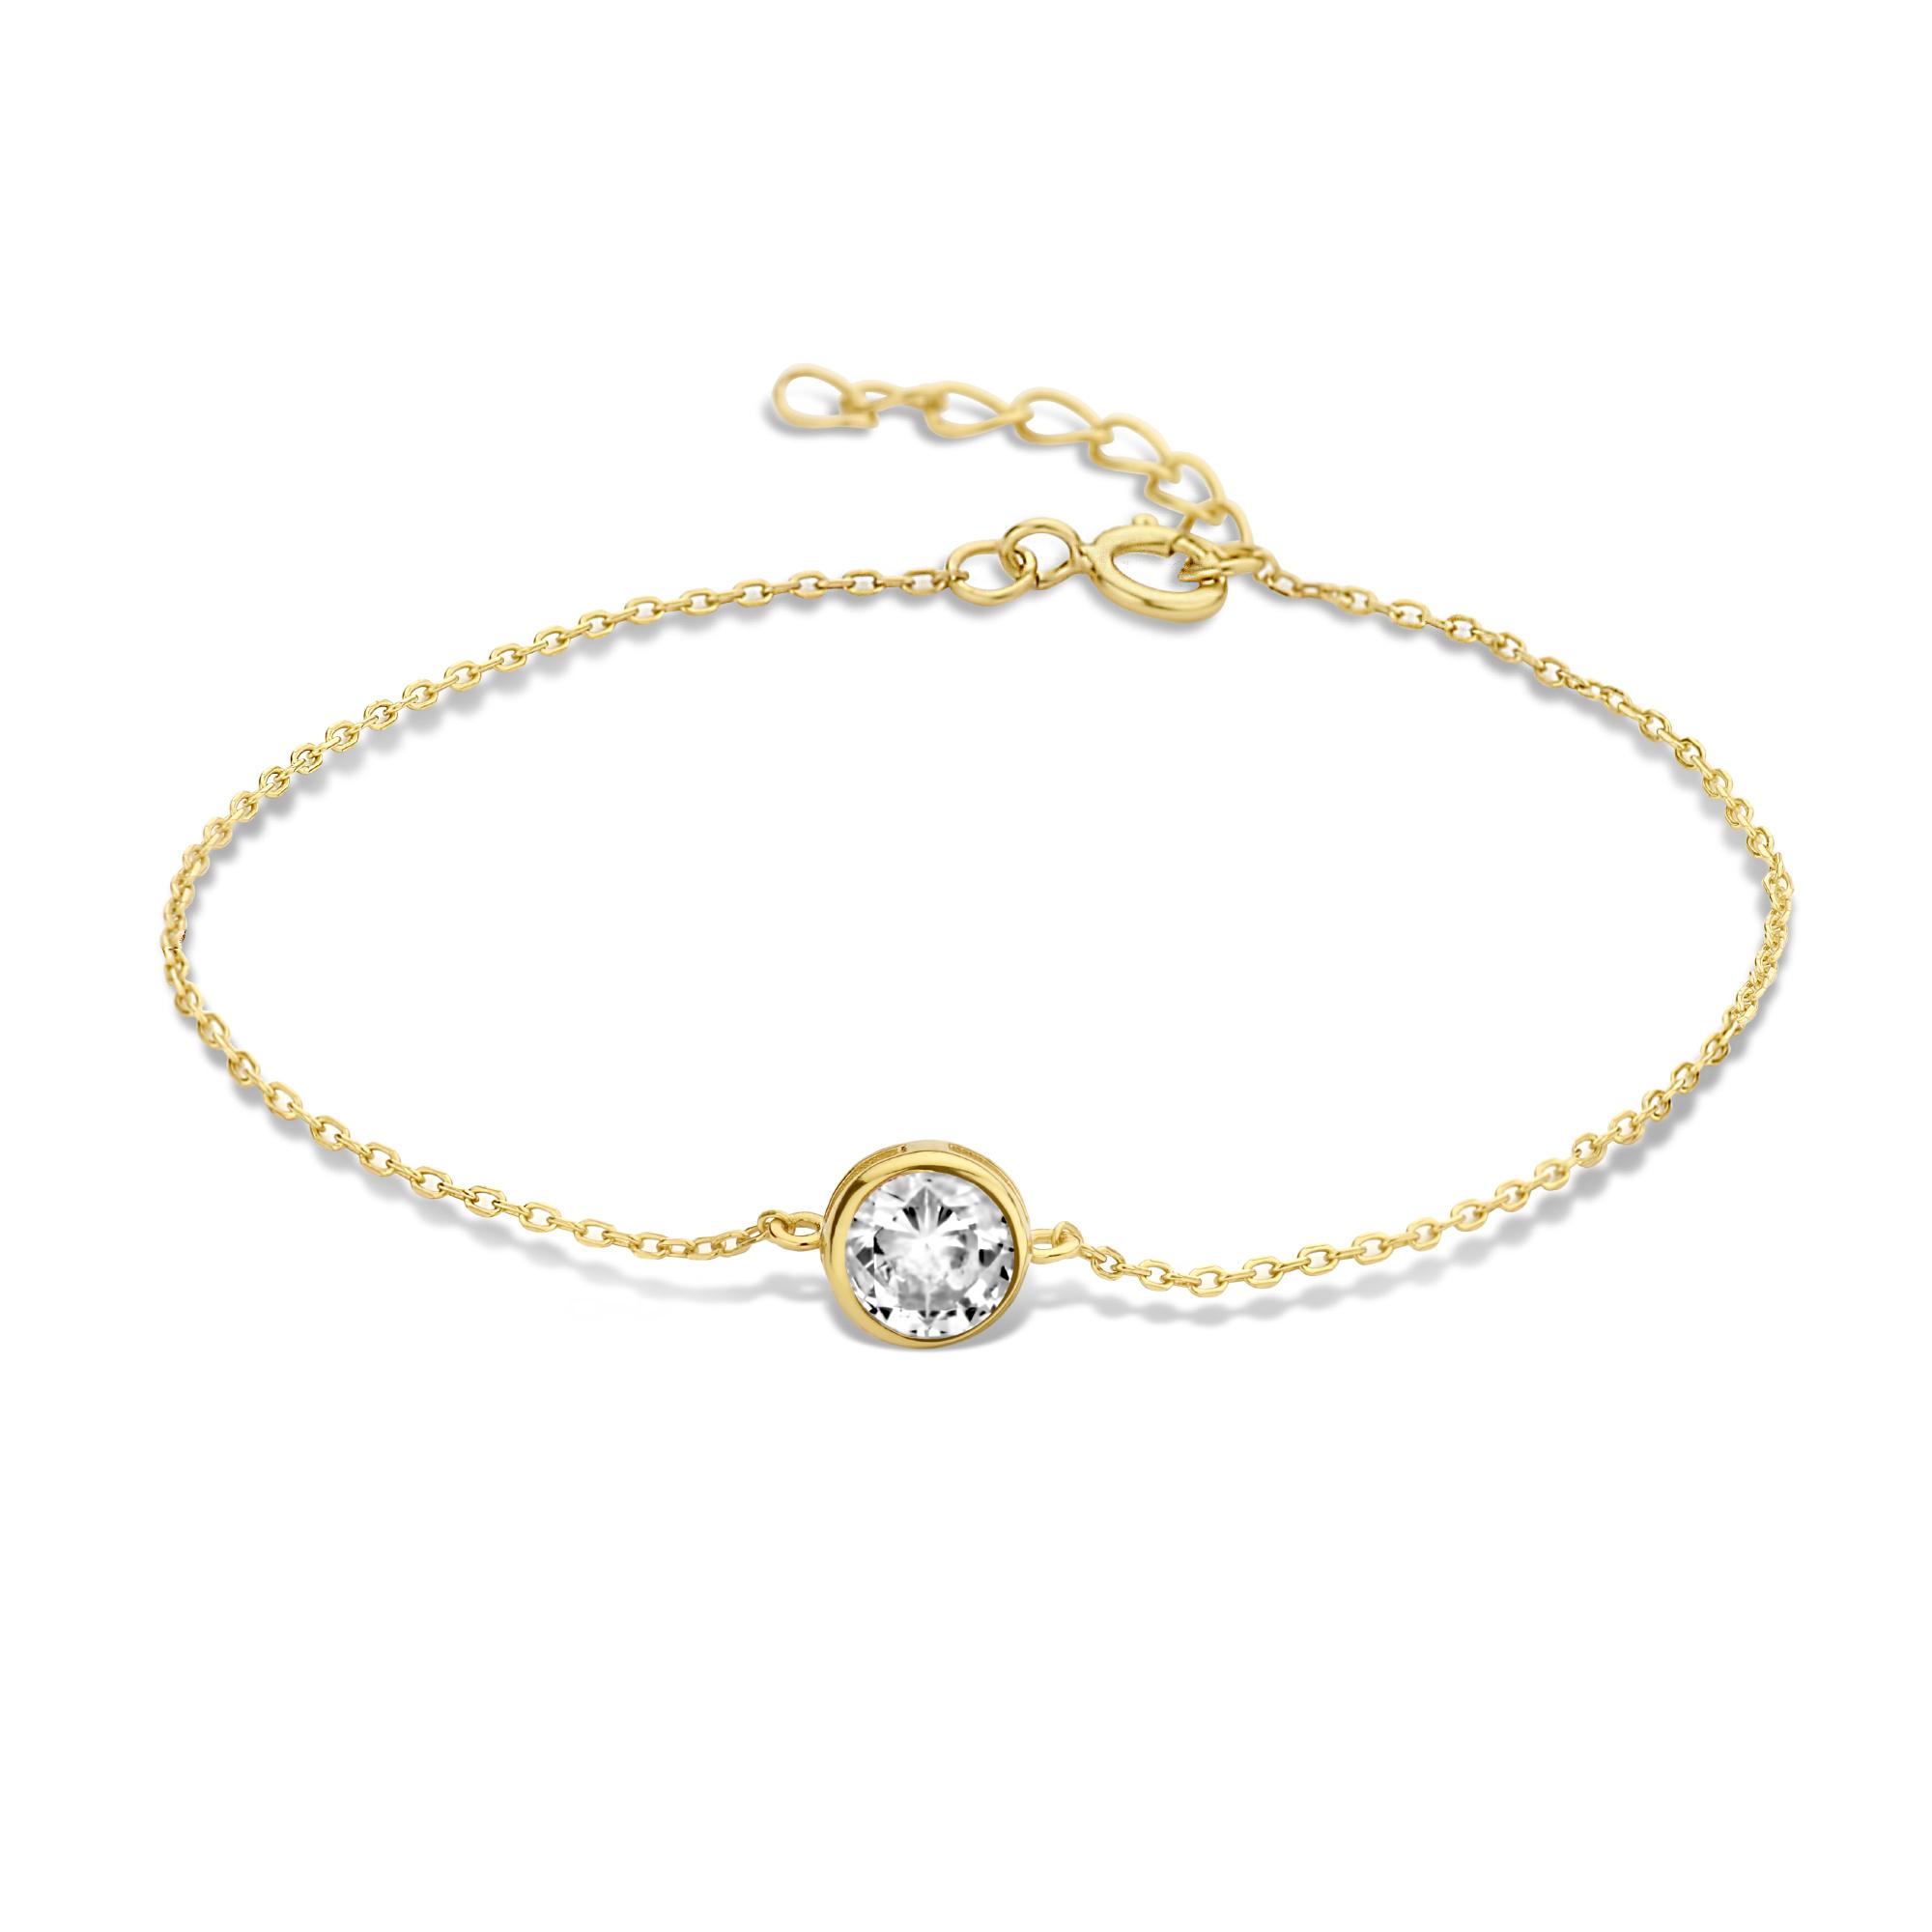 Violet Hamden Venus bracciale color oro in argento sterling 925 con birthstone